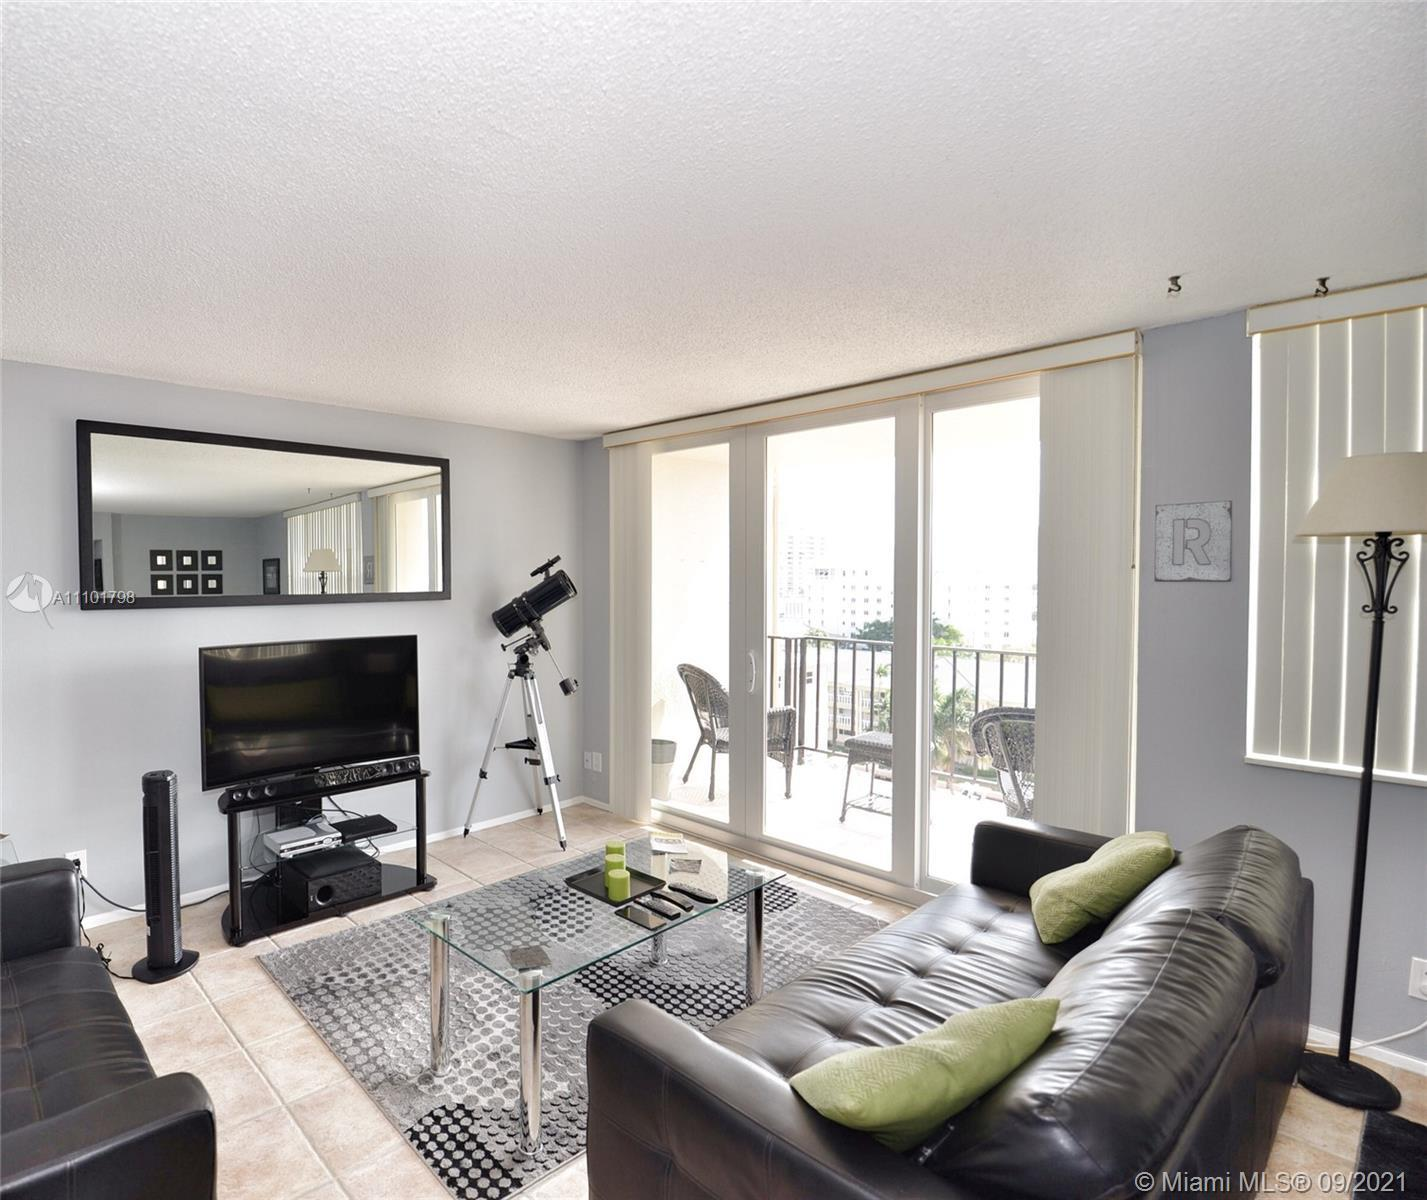 Excellent location, east of US1, desirable Coral Ridge neighborhood, 750 sq ft, one bedroom apartmen